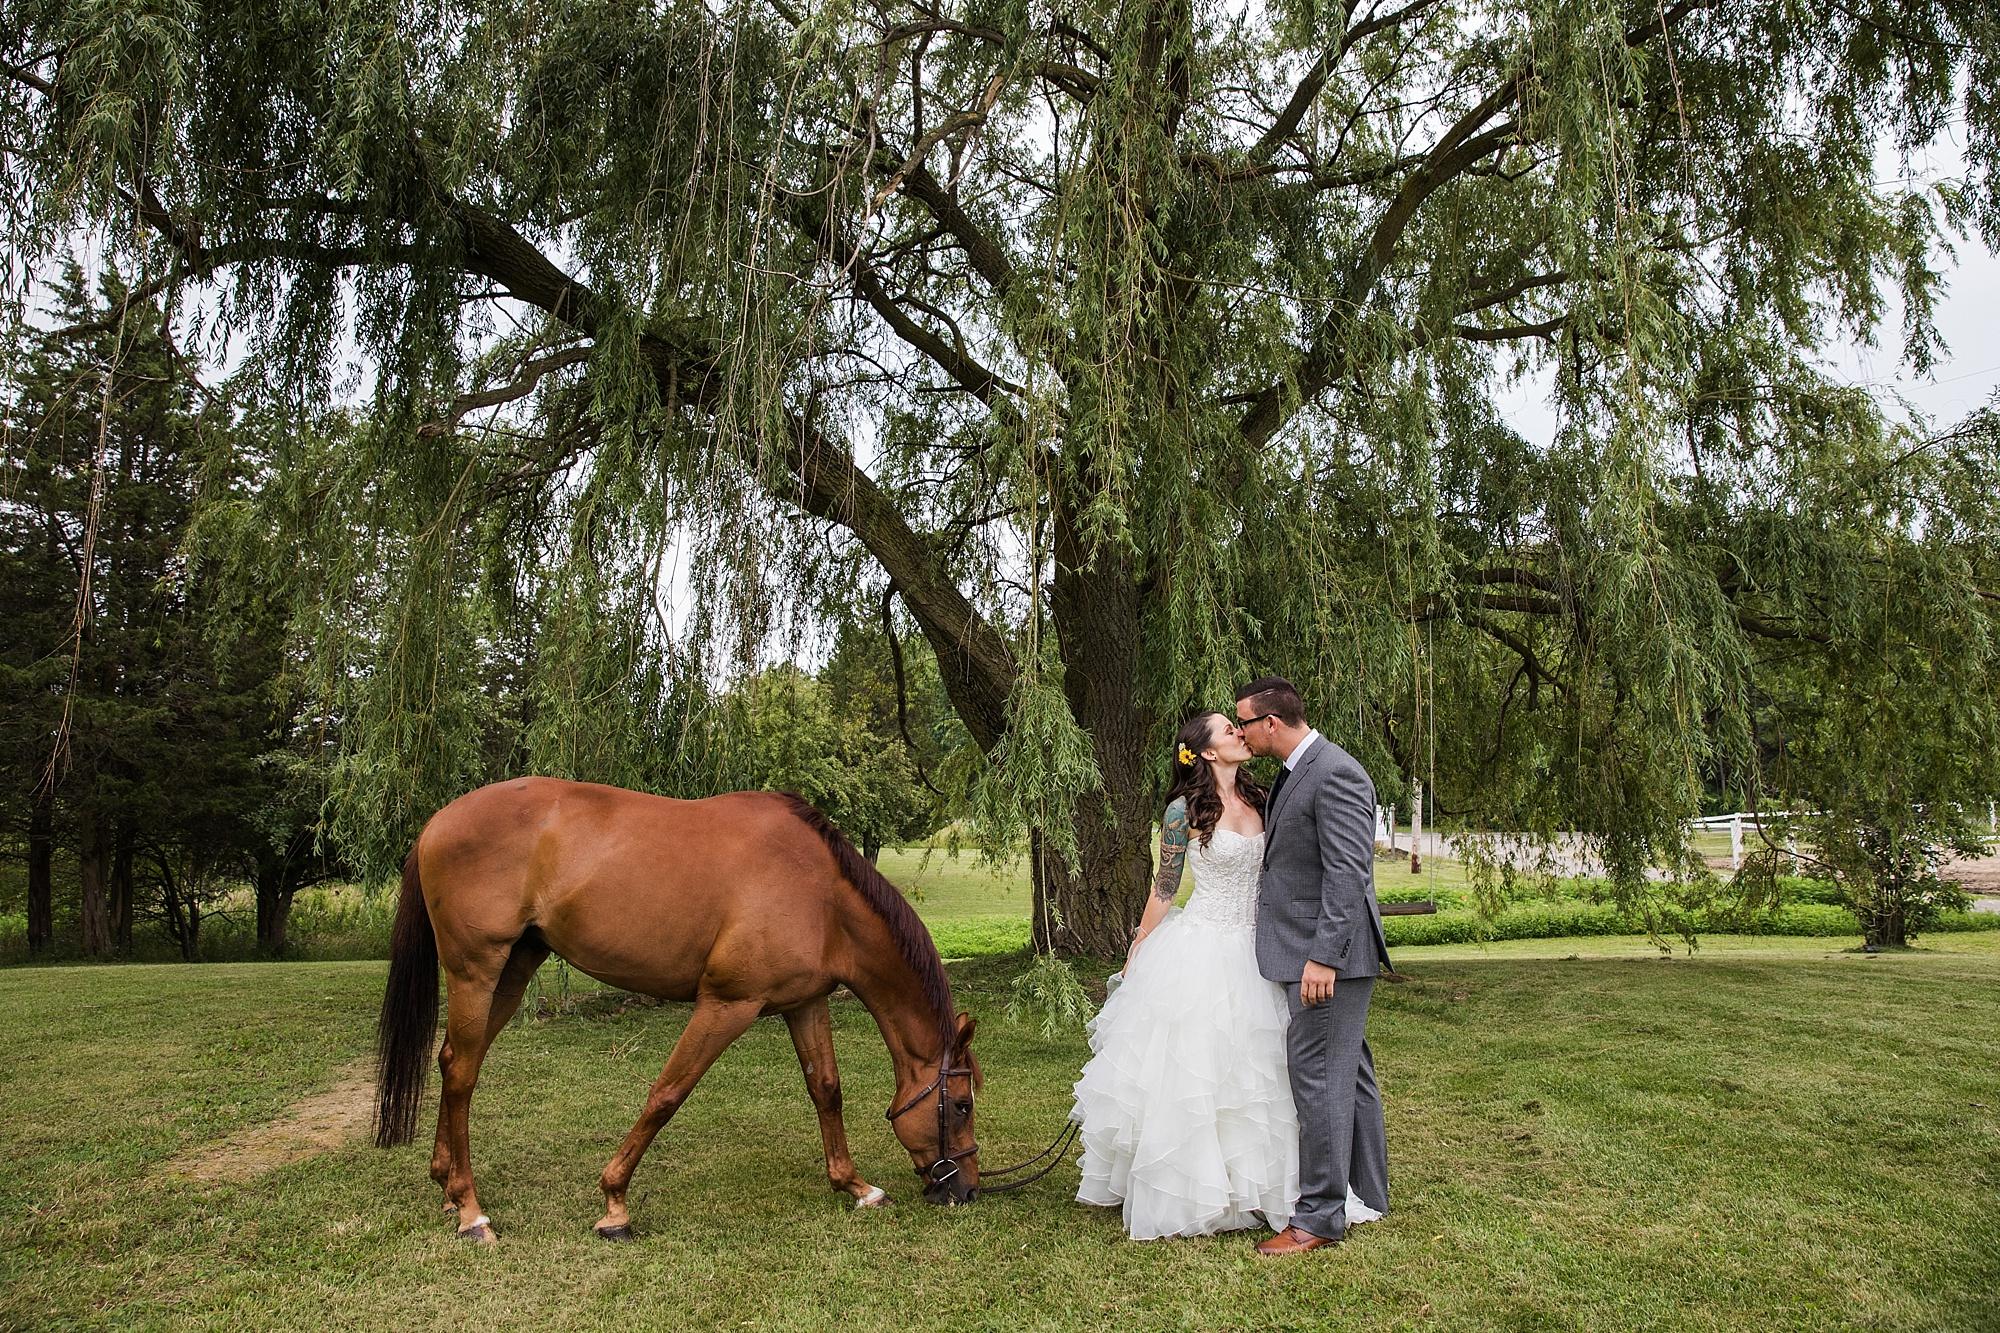 lipapark-hernderwinery-wedding_0051.jpg